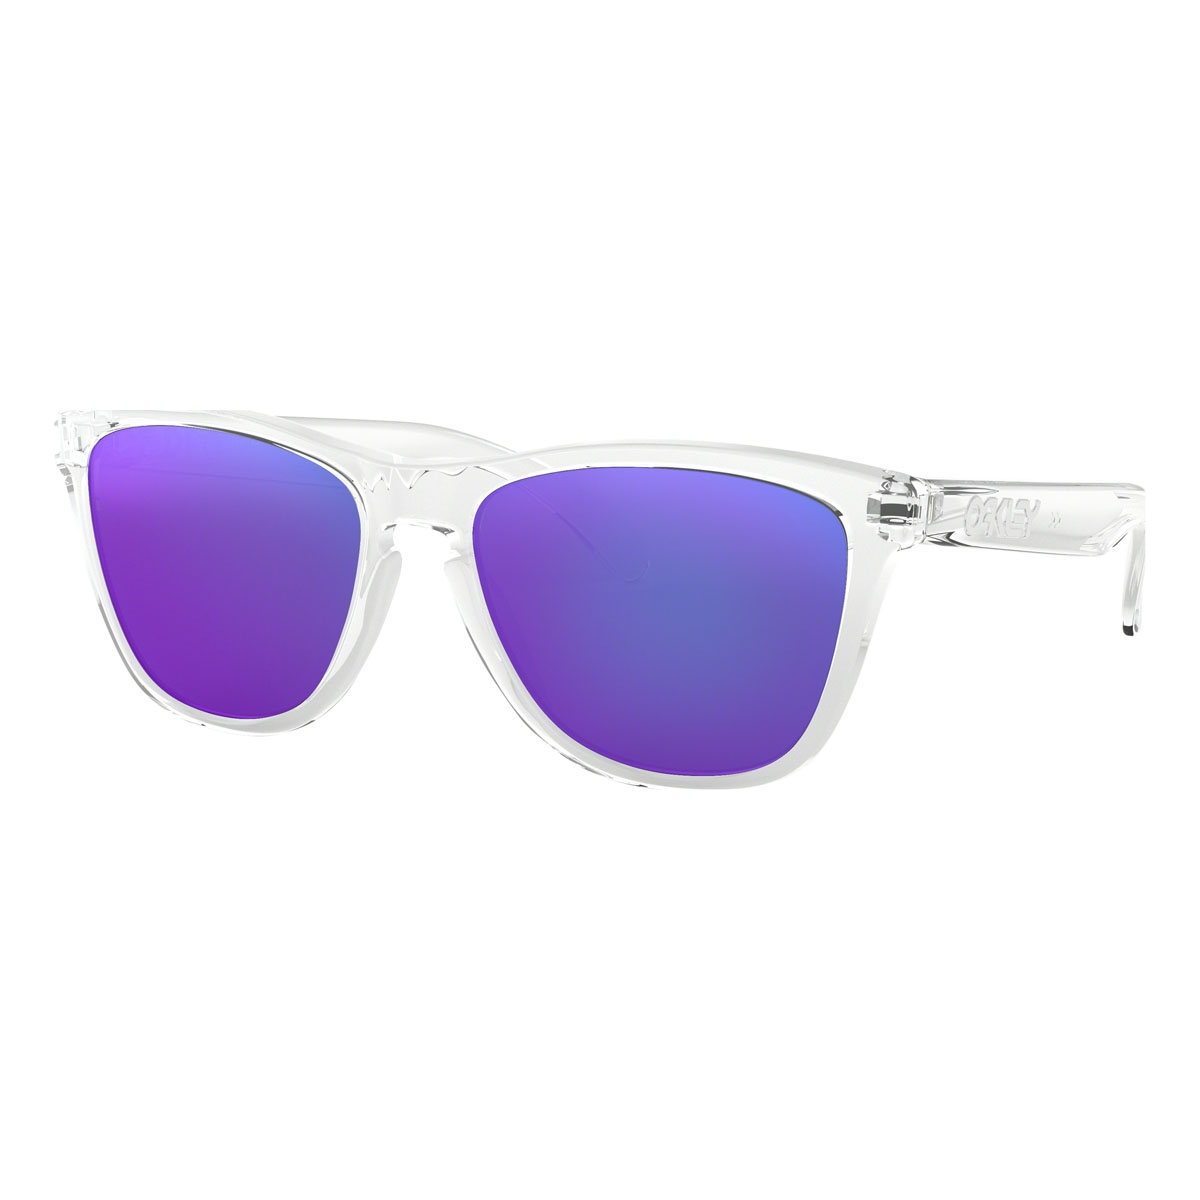 7c469dfecb57 Image of Oakley Frogskins Men's Sunglasses - Polished Clear Frame/Violet  Iridium Lens